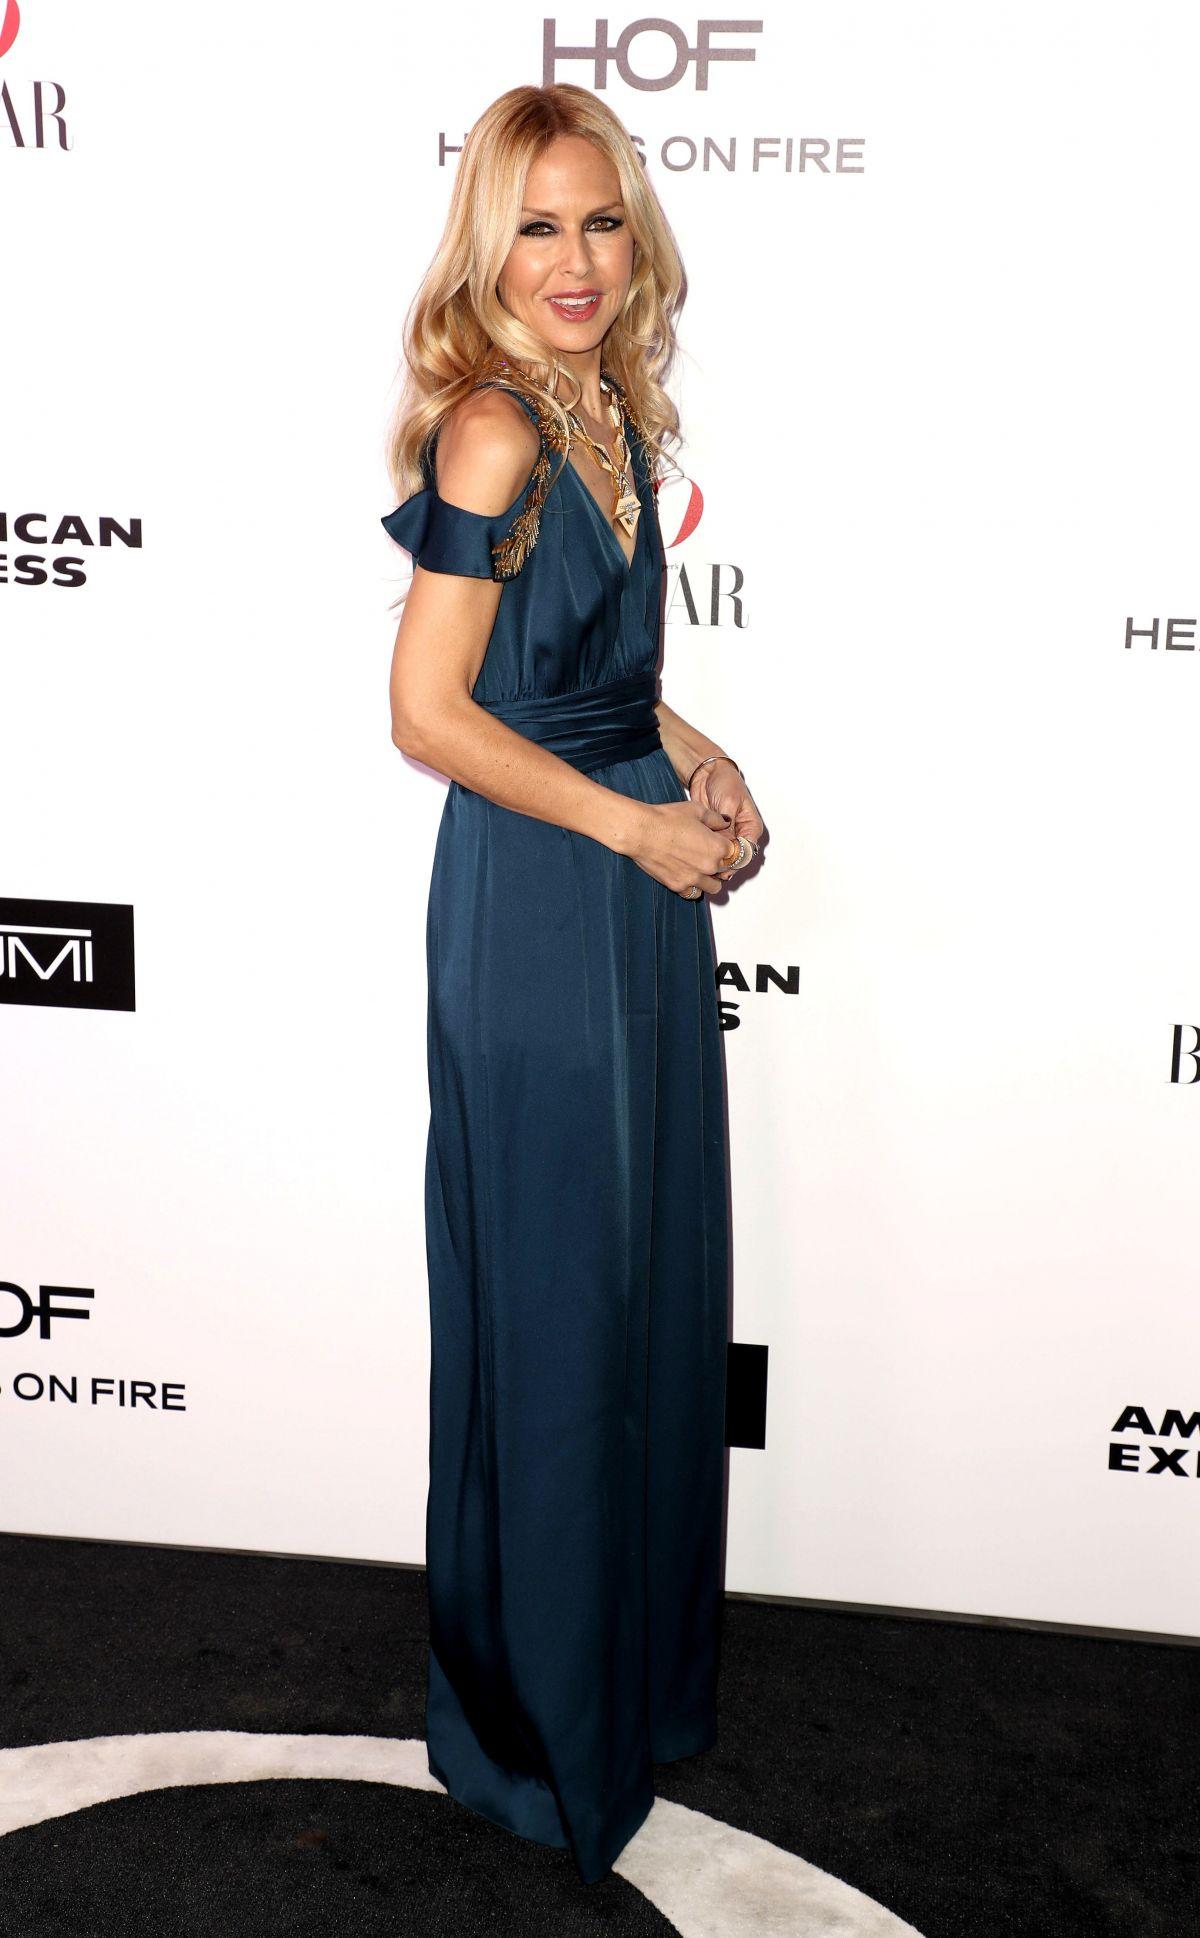 RACHEL ZOE at Harper's Bazaar 150 Most Fashionable Women Party in Hollywood 01/27/2017